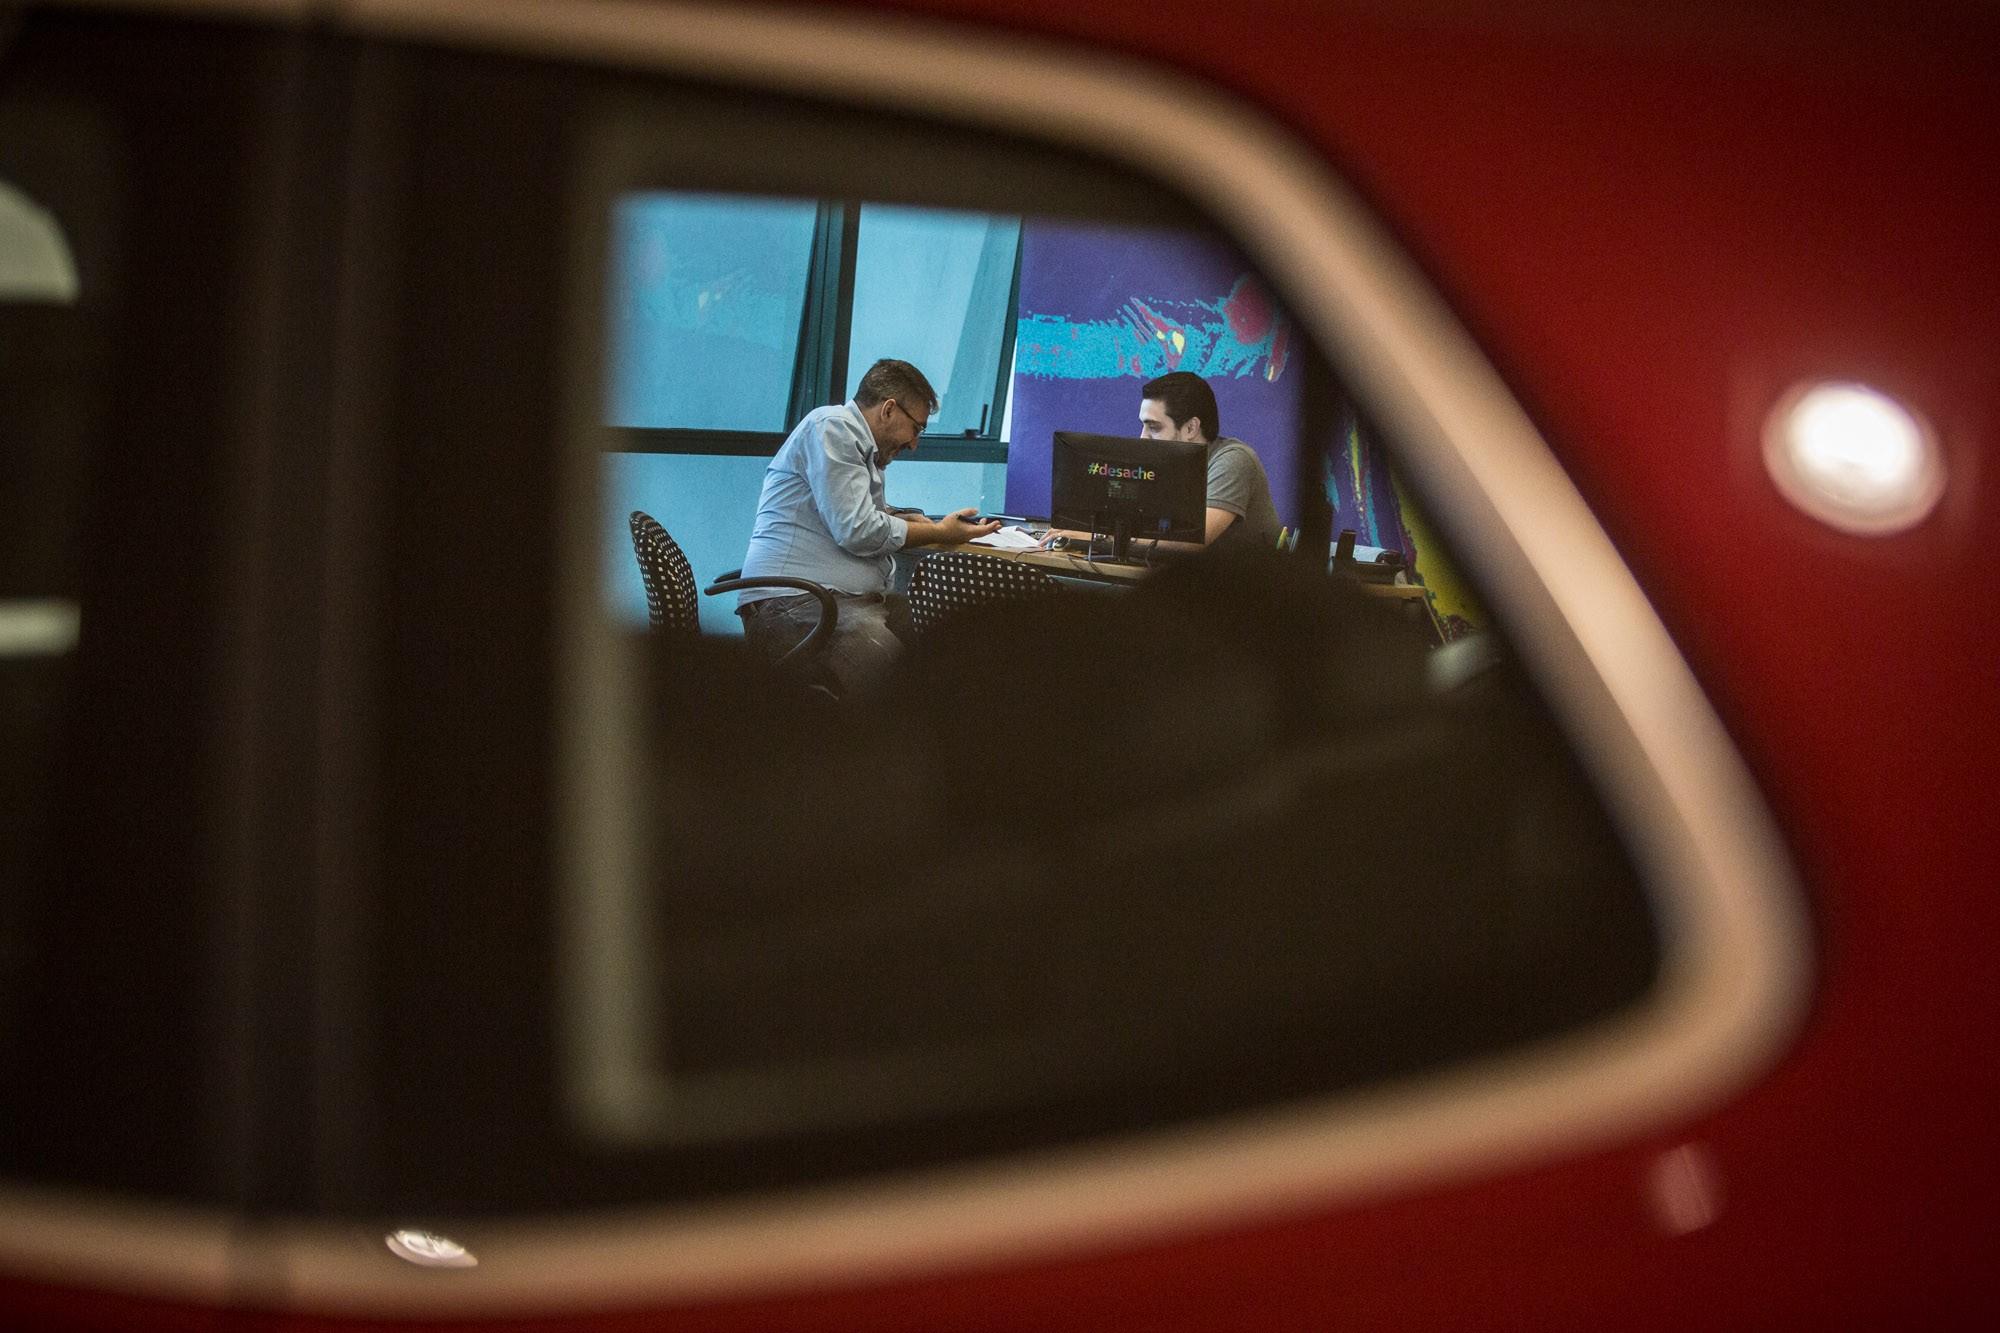 Financiamento de veículos novos sobe 14,7% no 1º semestre